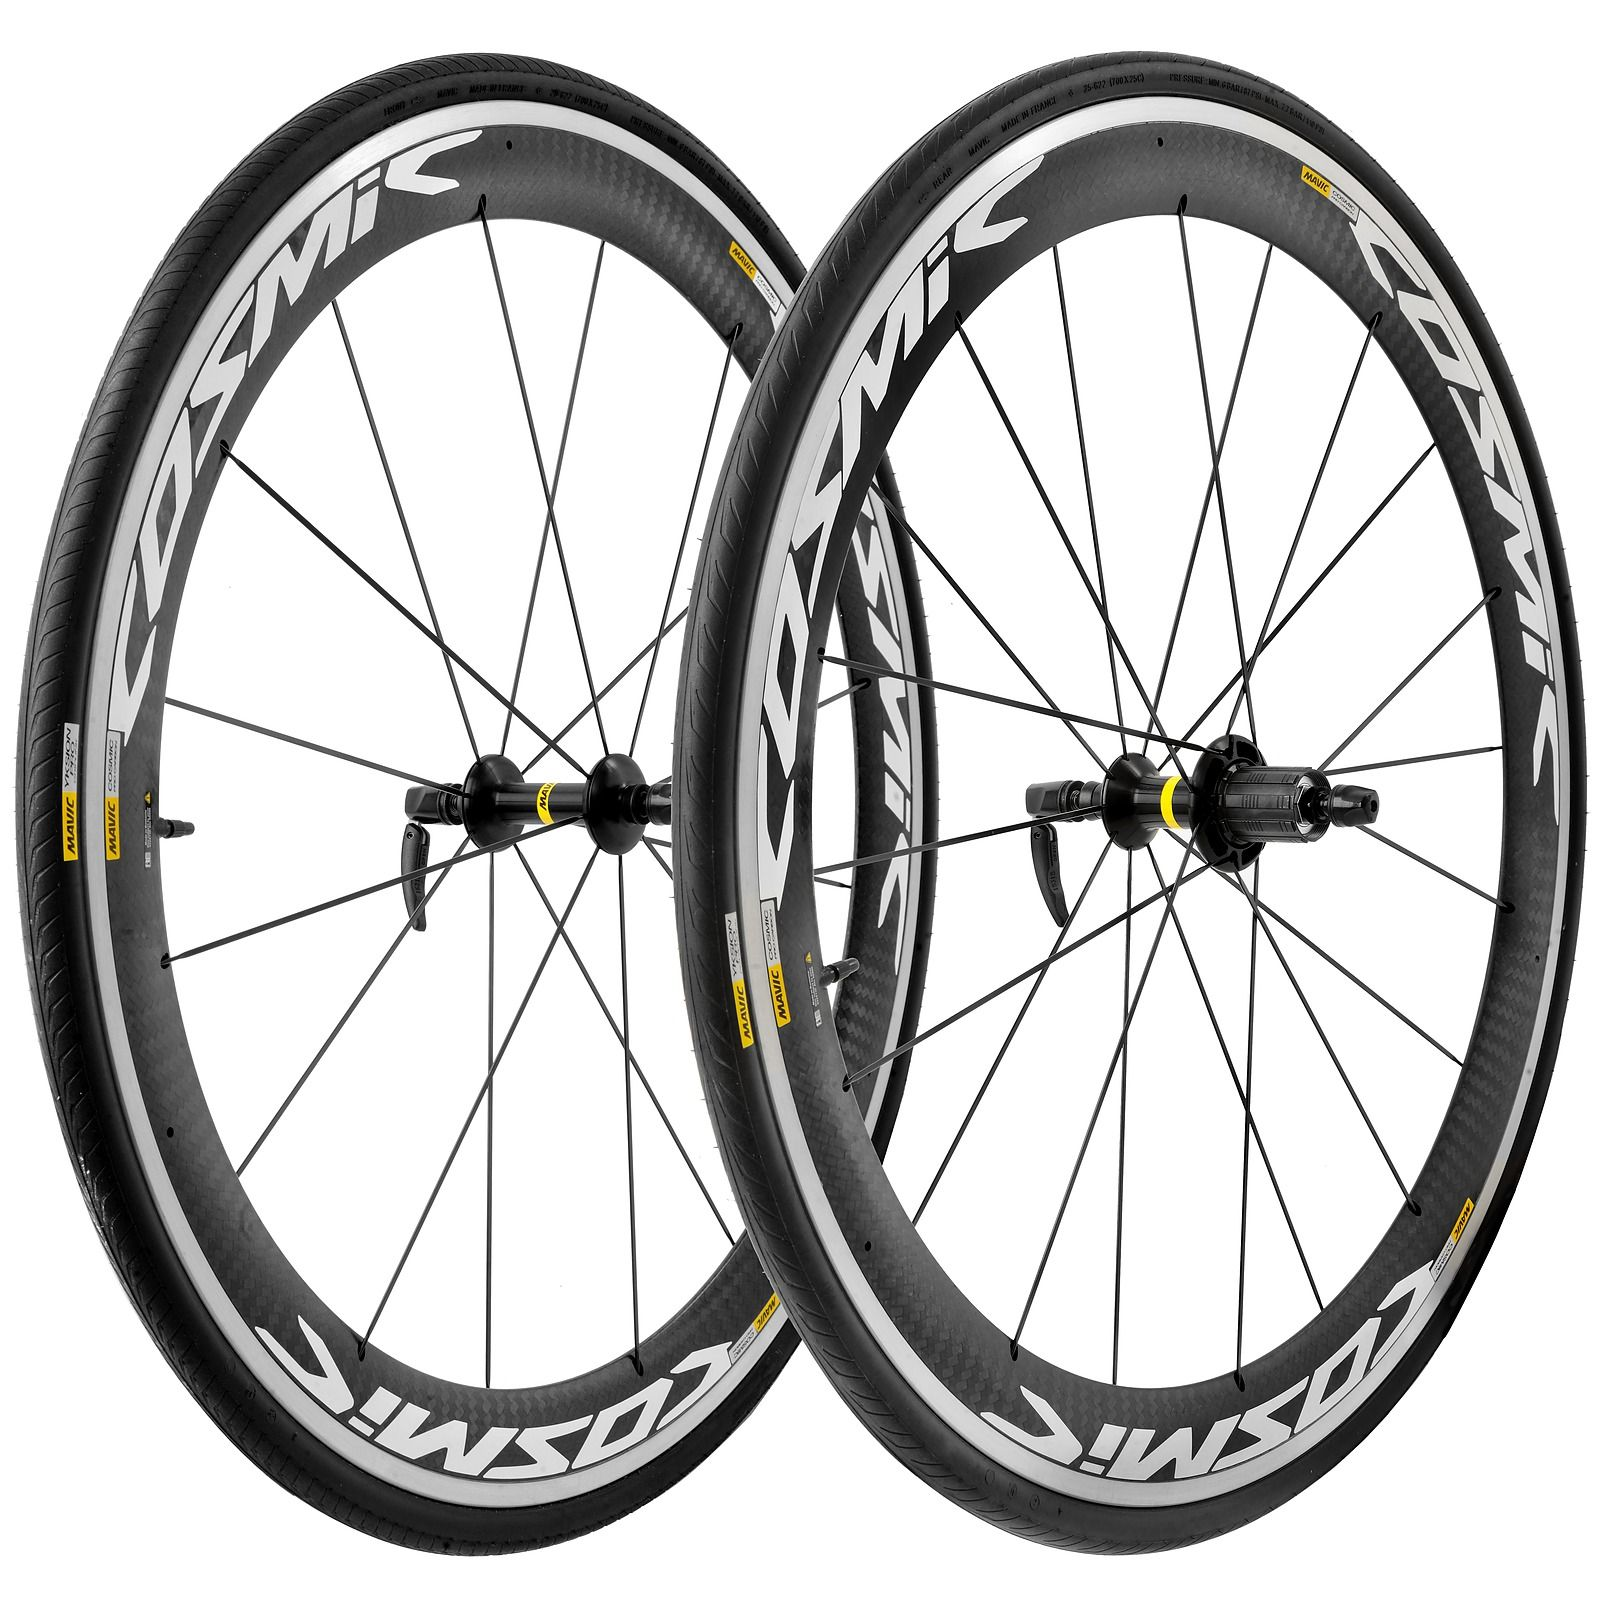 Mavic Cosmic Pro Carbon w/Yksion Tires Wheelset The